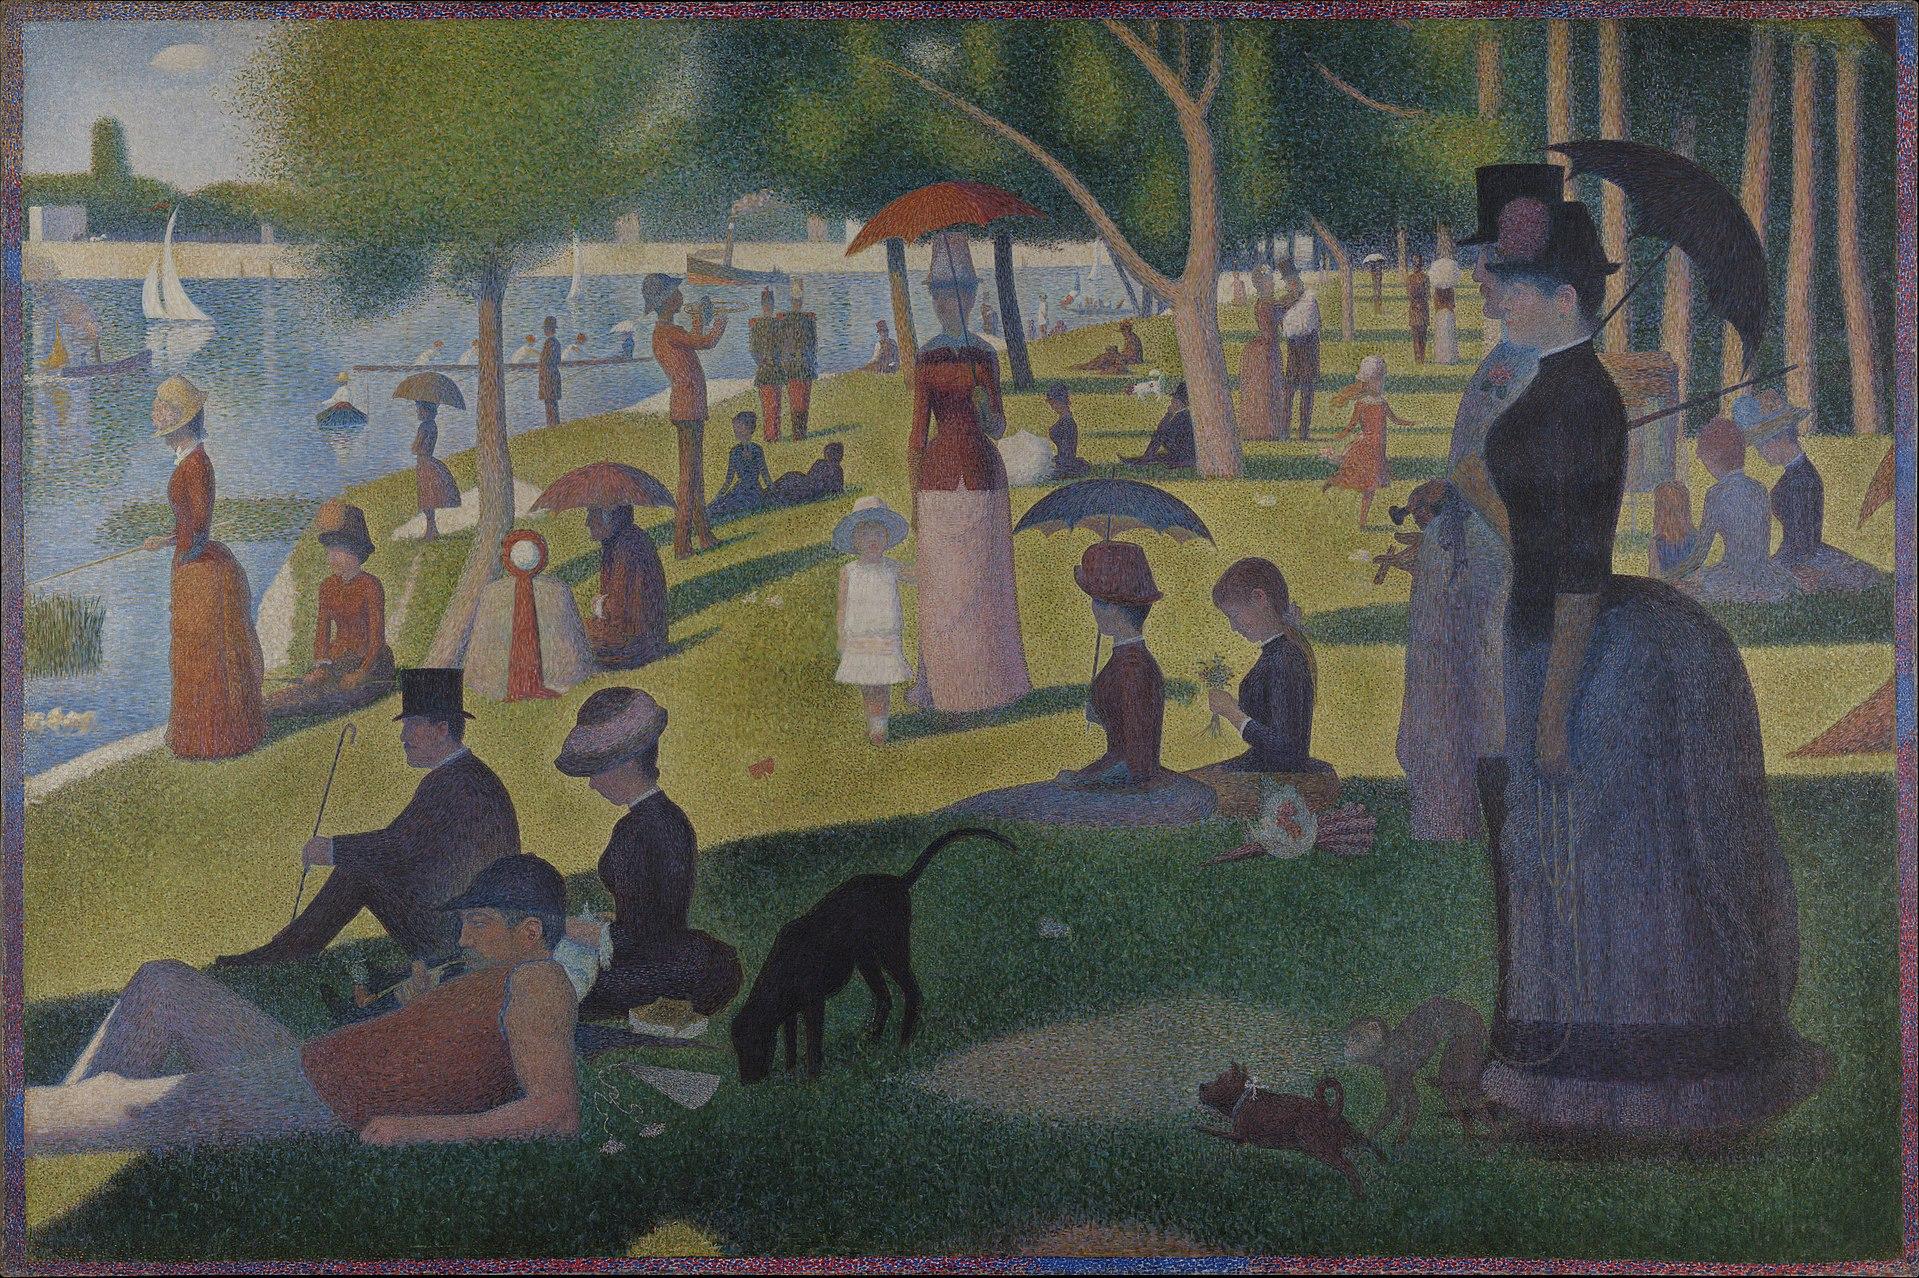 1920px-Georges_Seurat_-_A_Sunday_on_La_Grande_Jatte_--_1884_-_Google_Art_Project.jpg